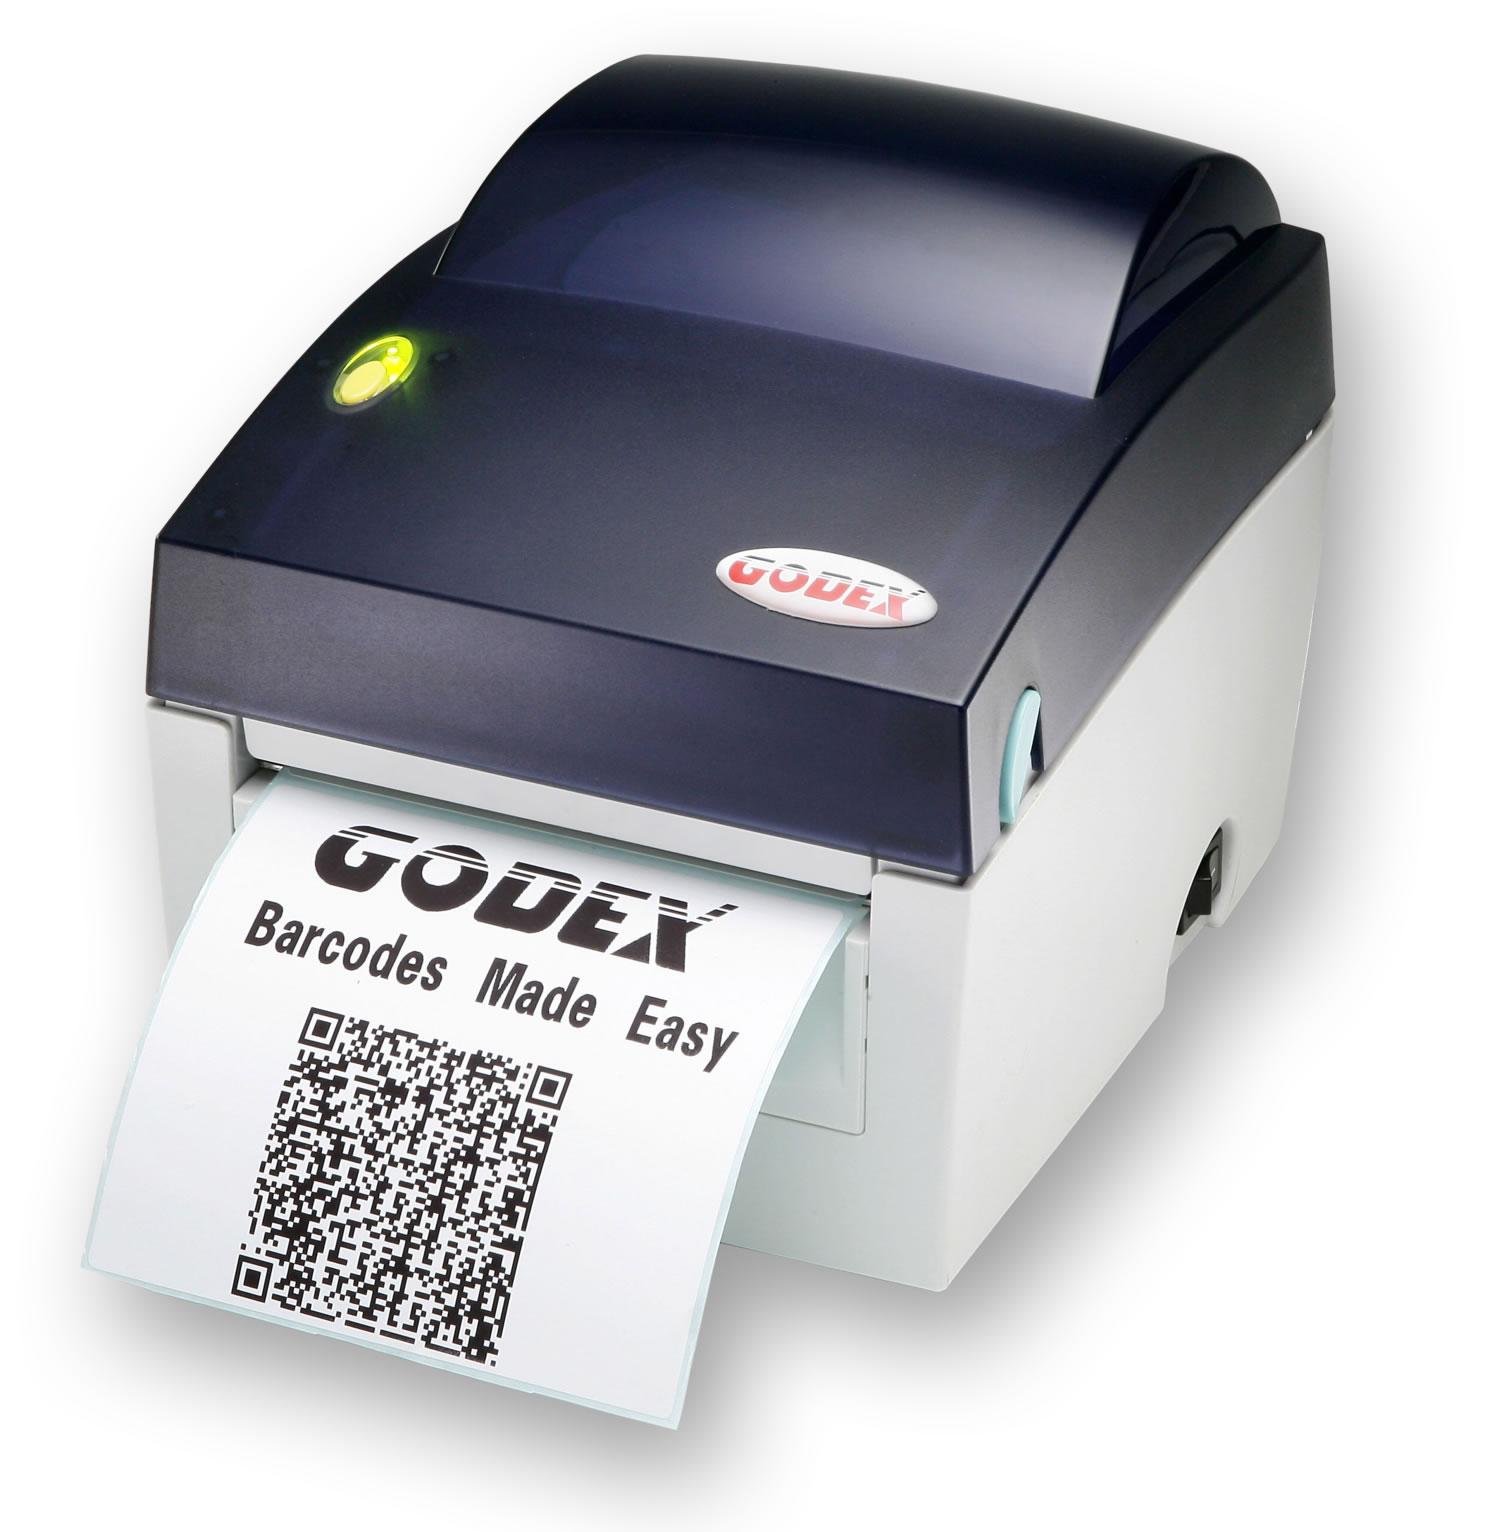 GODEX EZ DT4 DRIVER FREE